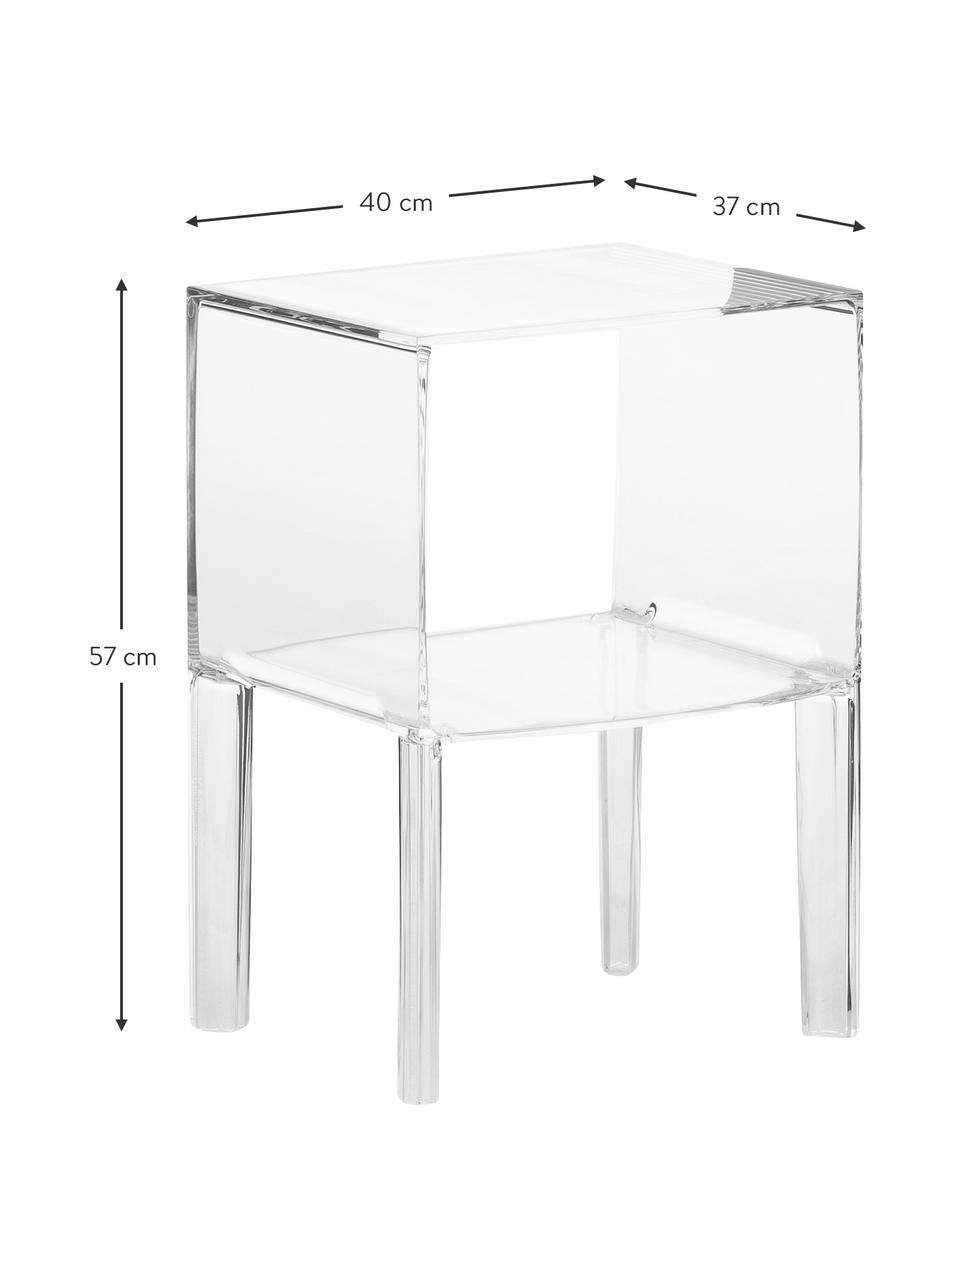 Comodino Ghost Buster, Materiale sintetico, Trasparente, Larg. 40 x Alt. 57 cm